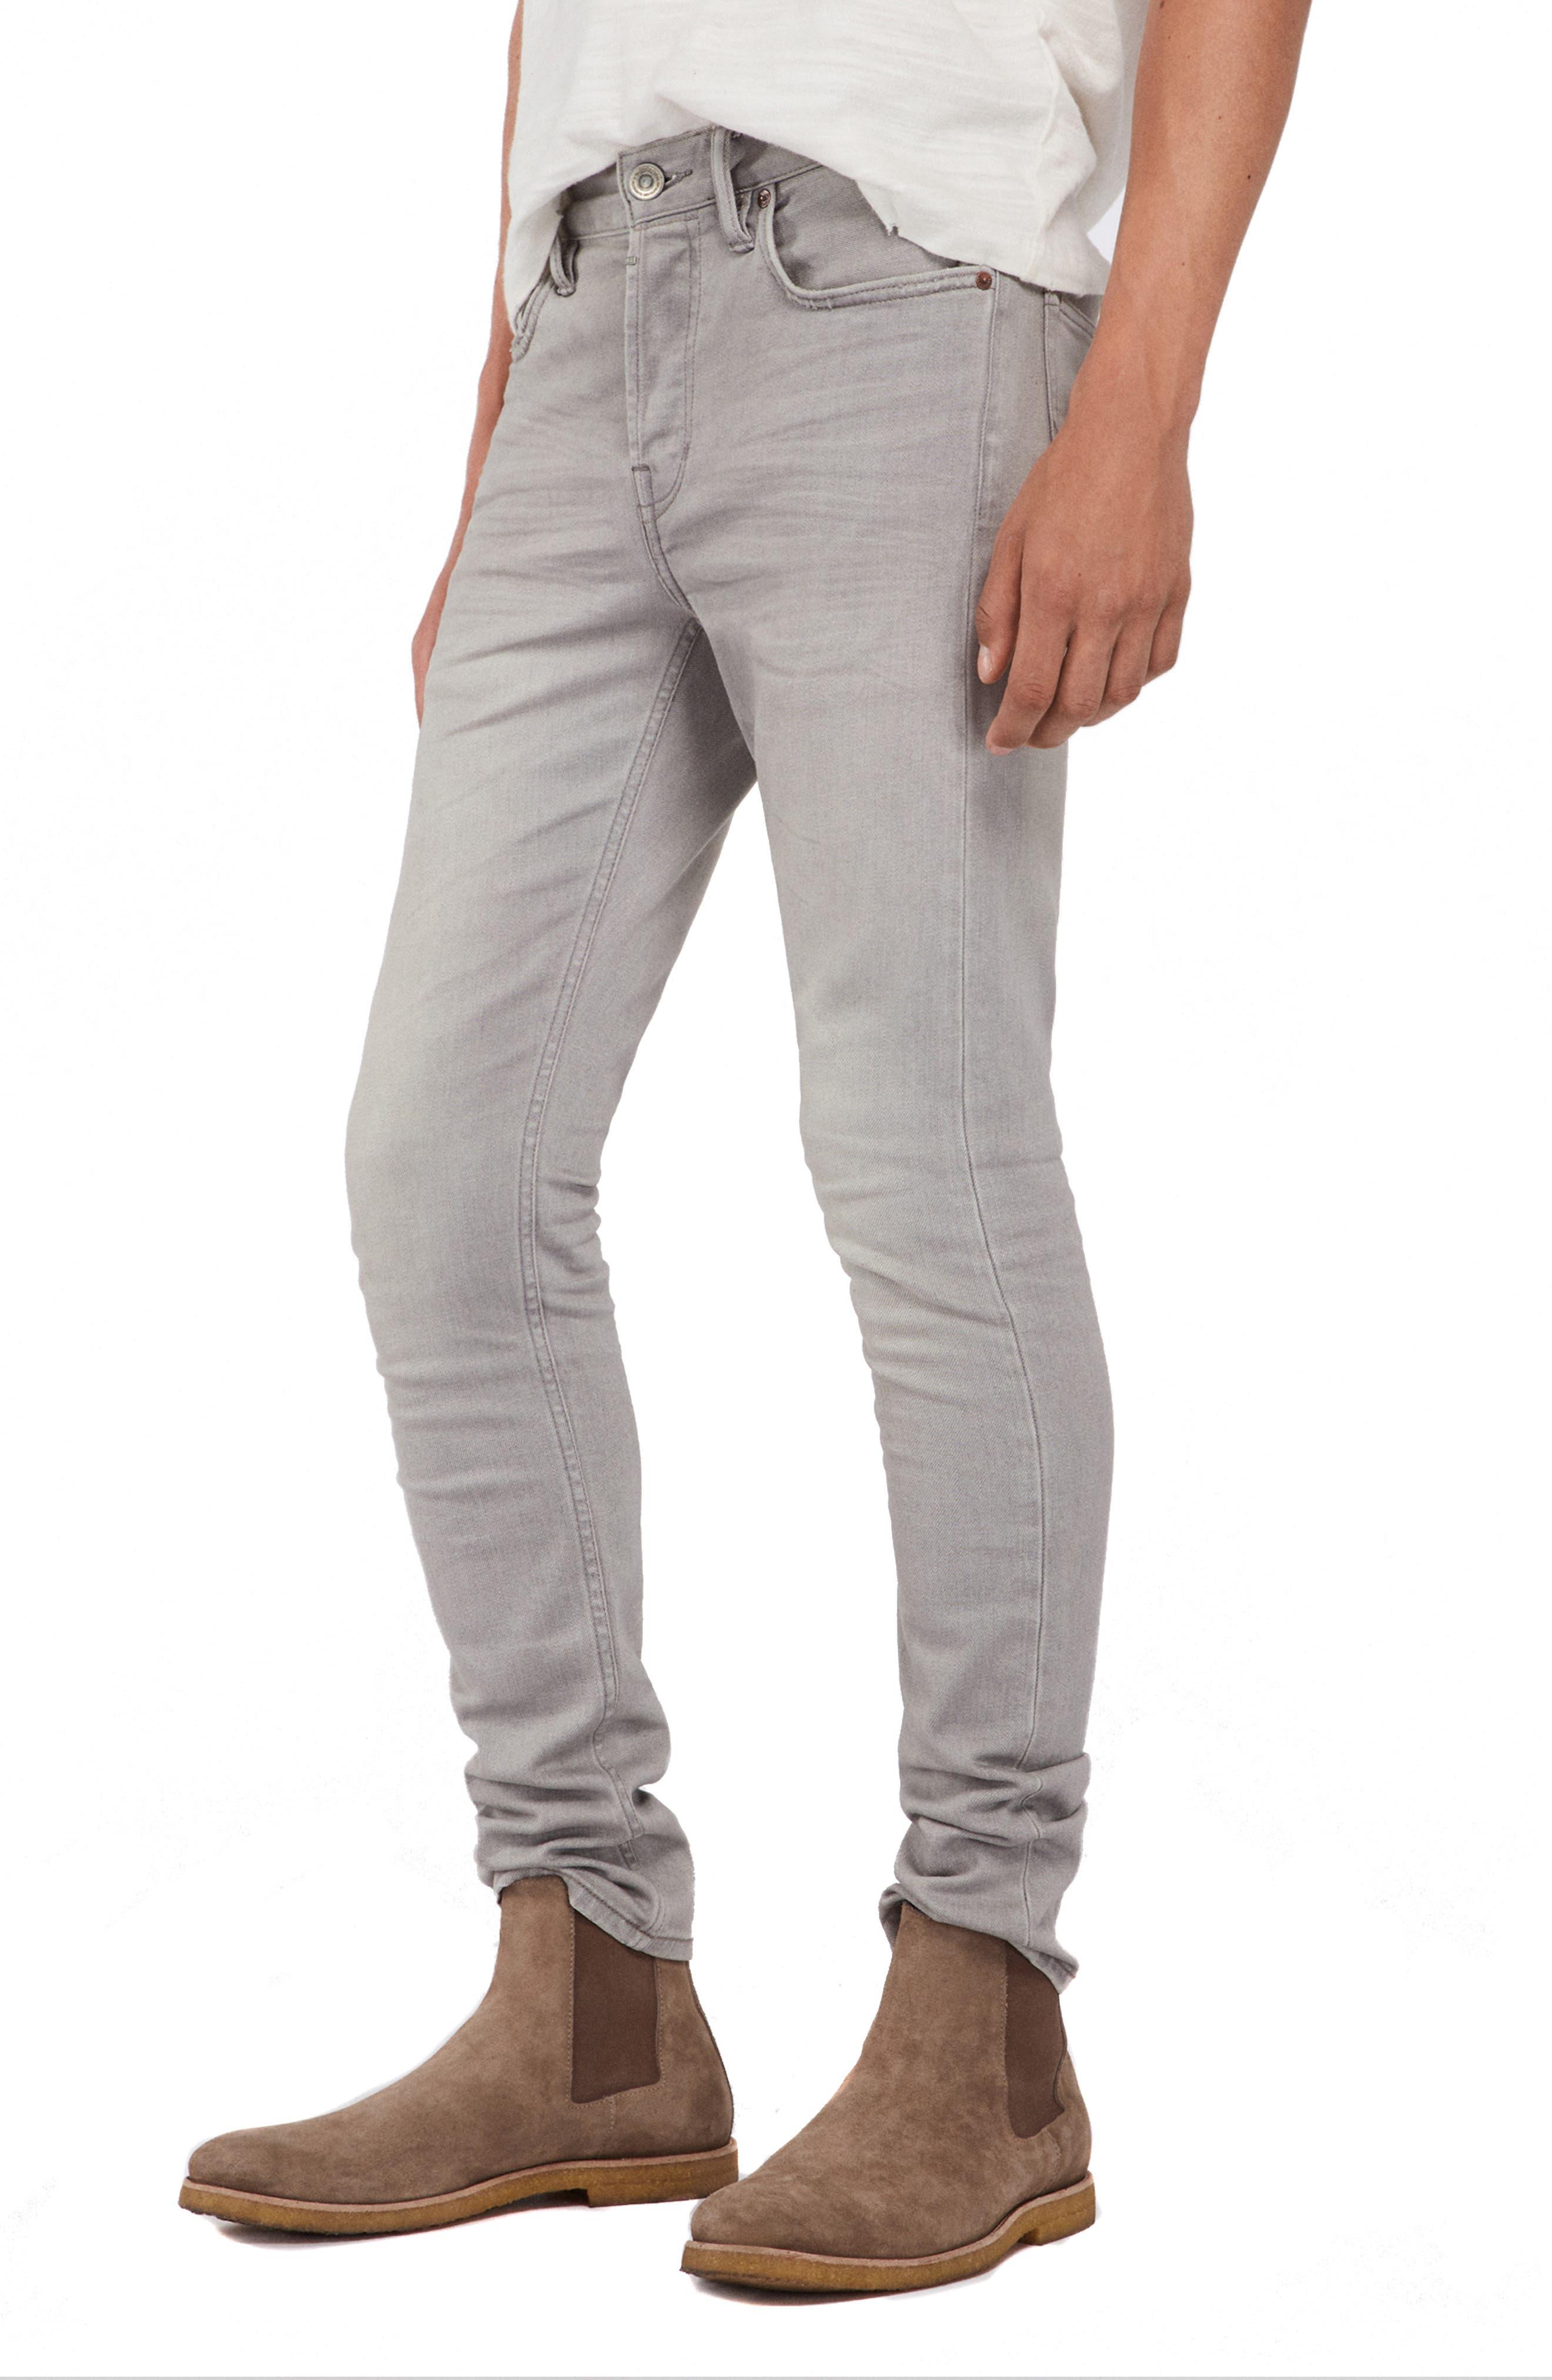 ALLSAINTS, Raveline Cigarette Skinny Fit Jeans, Alternate thumbnail 4, color, GREY